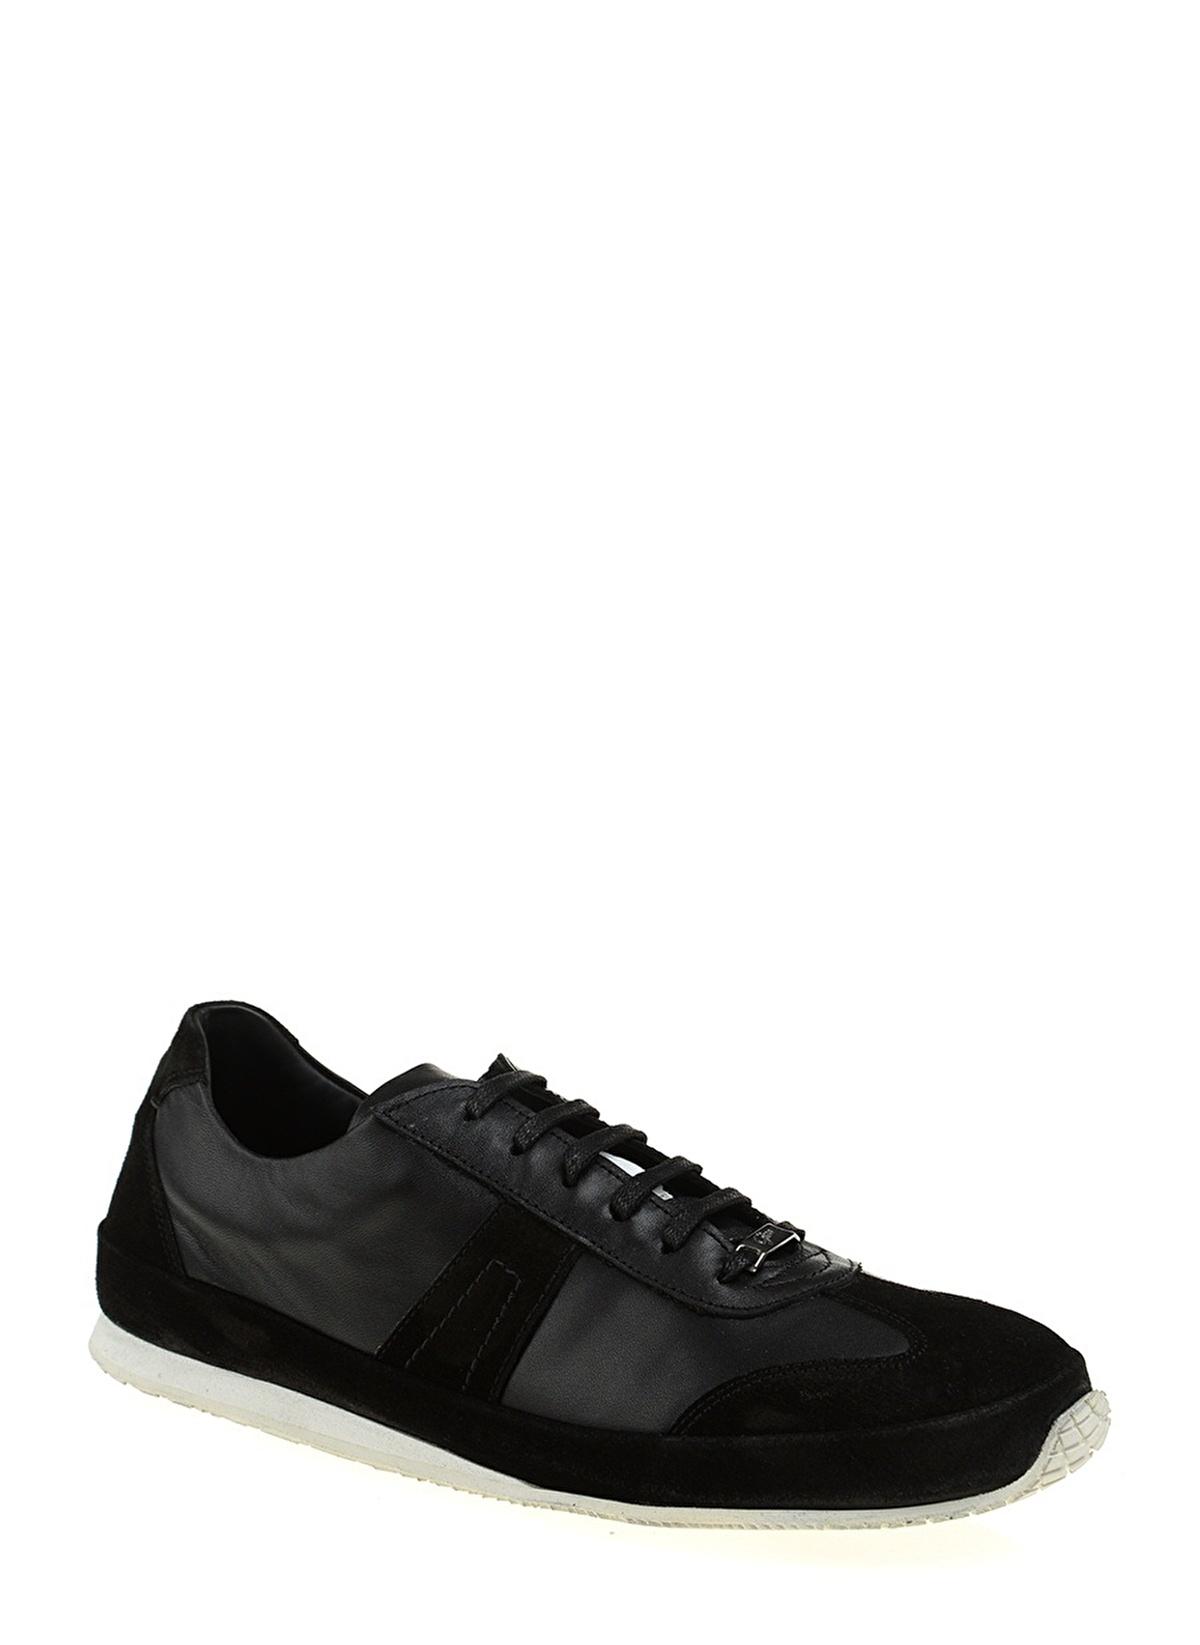 Divarese Lifestyle Ayakkabı 5017252 E Sneaker – 165.0 TL